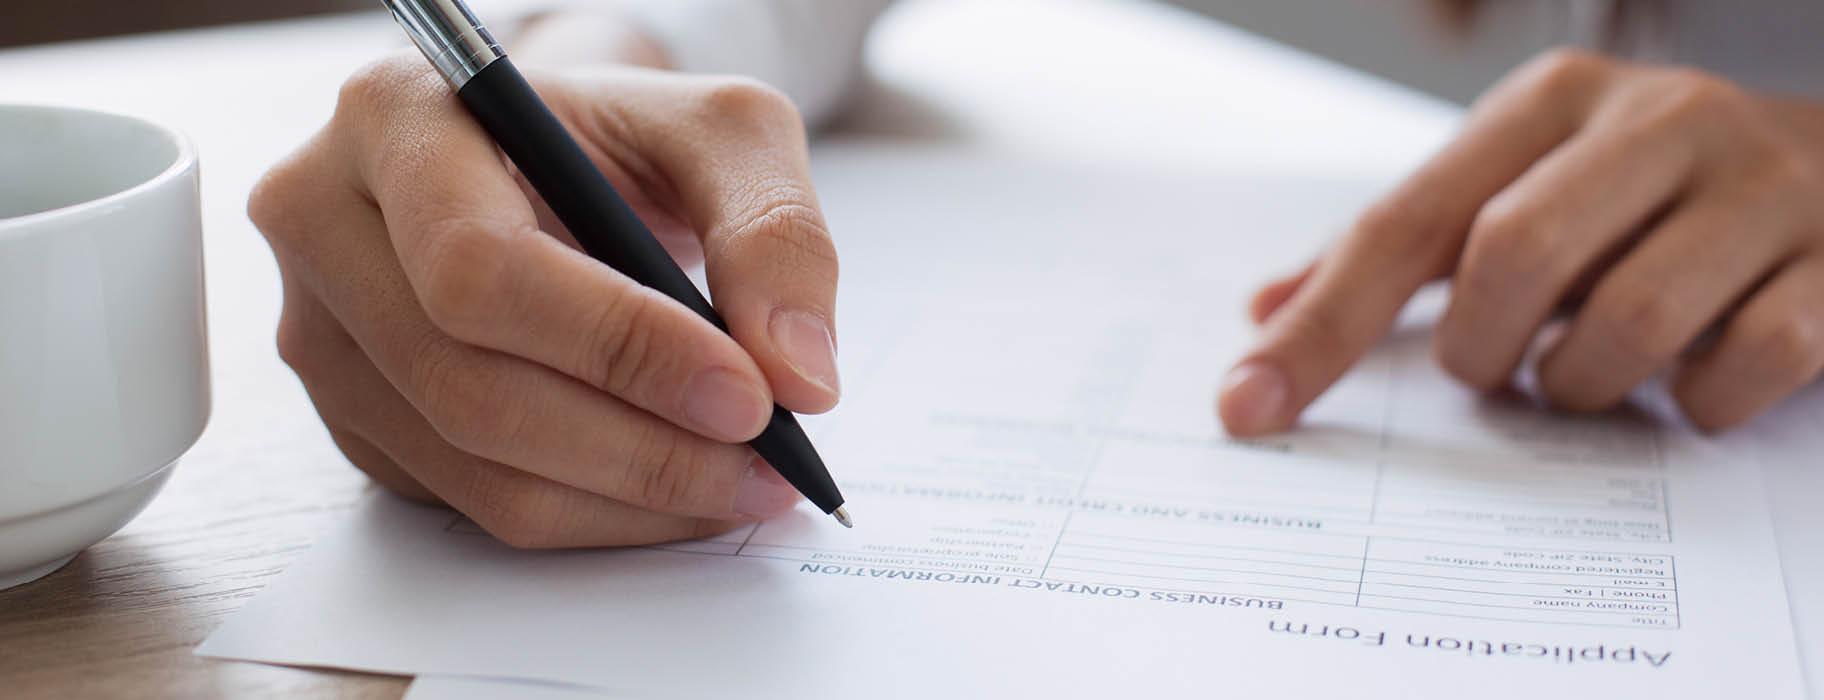 Addressing Gaps Directly On Your Resume